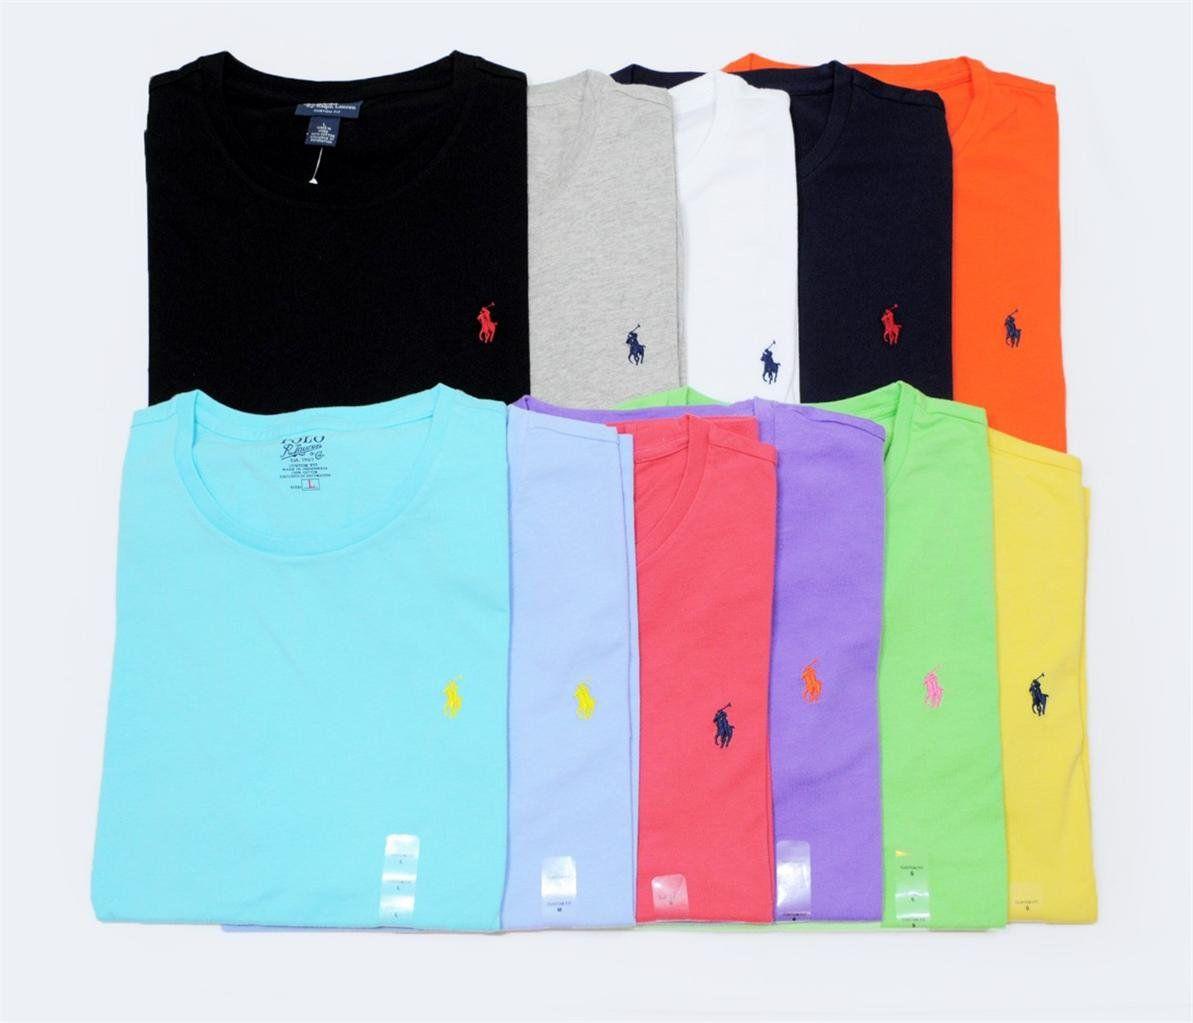 Ralph lauren polo bedding for girls - Polo Ralph Ralph Lauren Polo Shirts For Men Pack